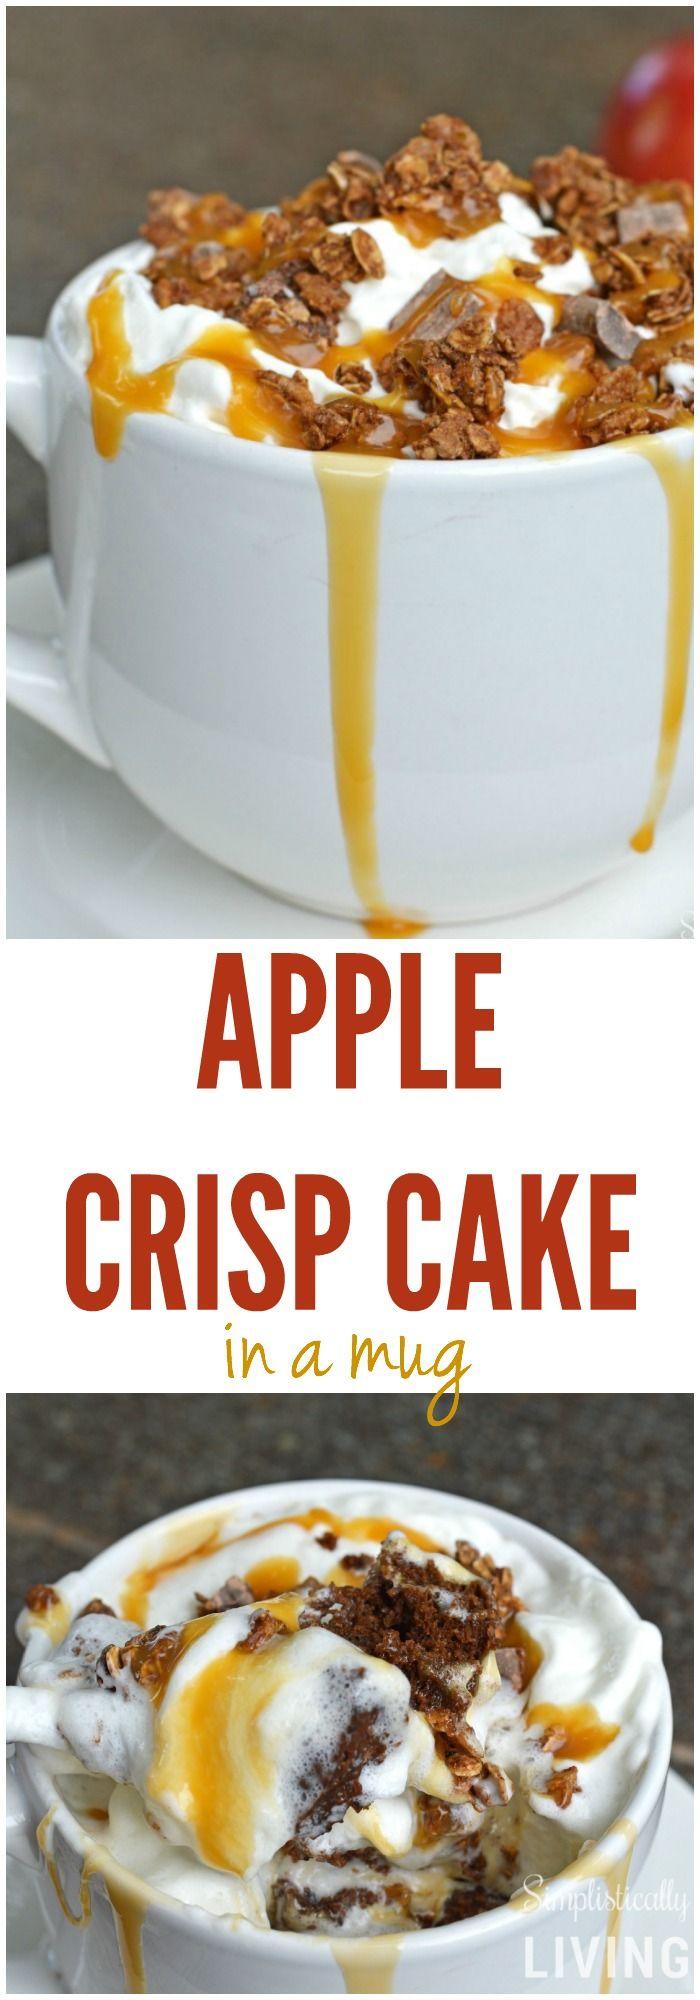 Apple Crisp Cake in a Mug made with @Yoplait yogurt! #ad #yum #SnackandSmile